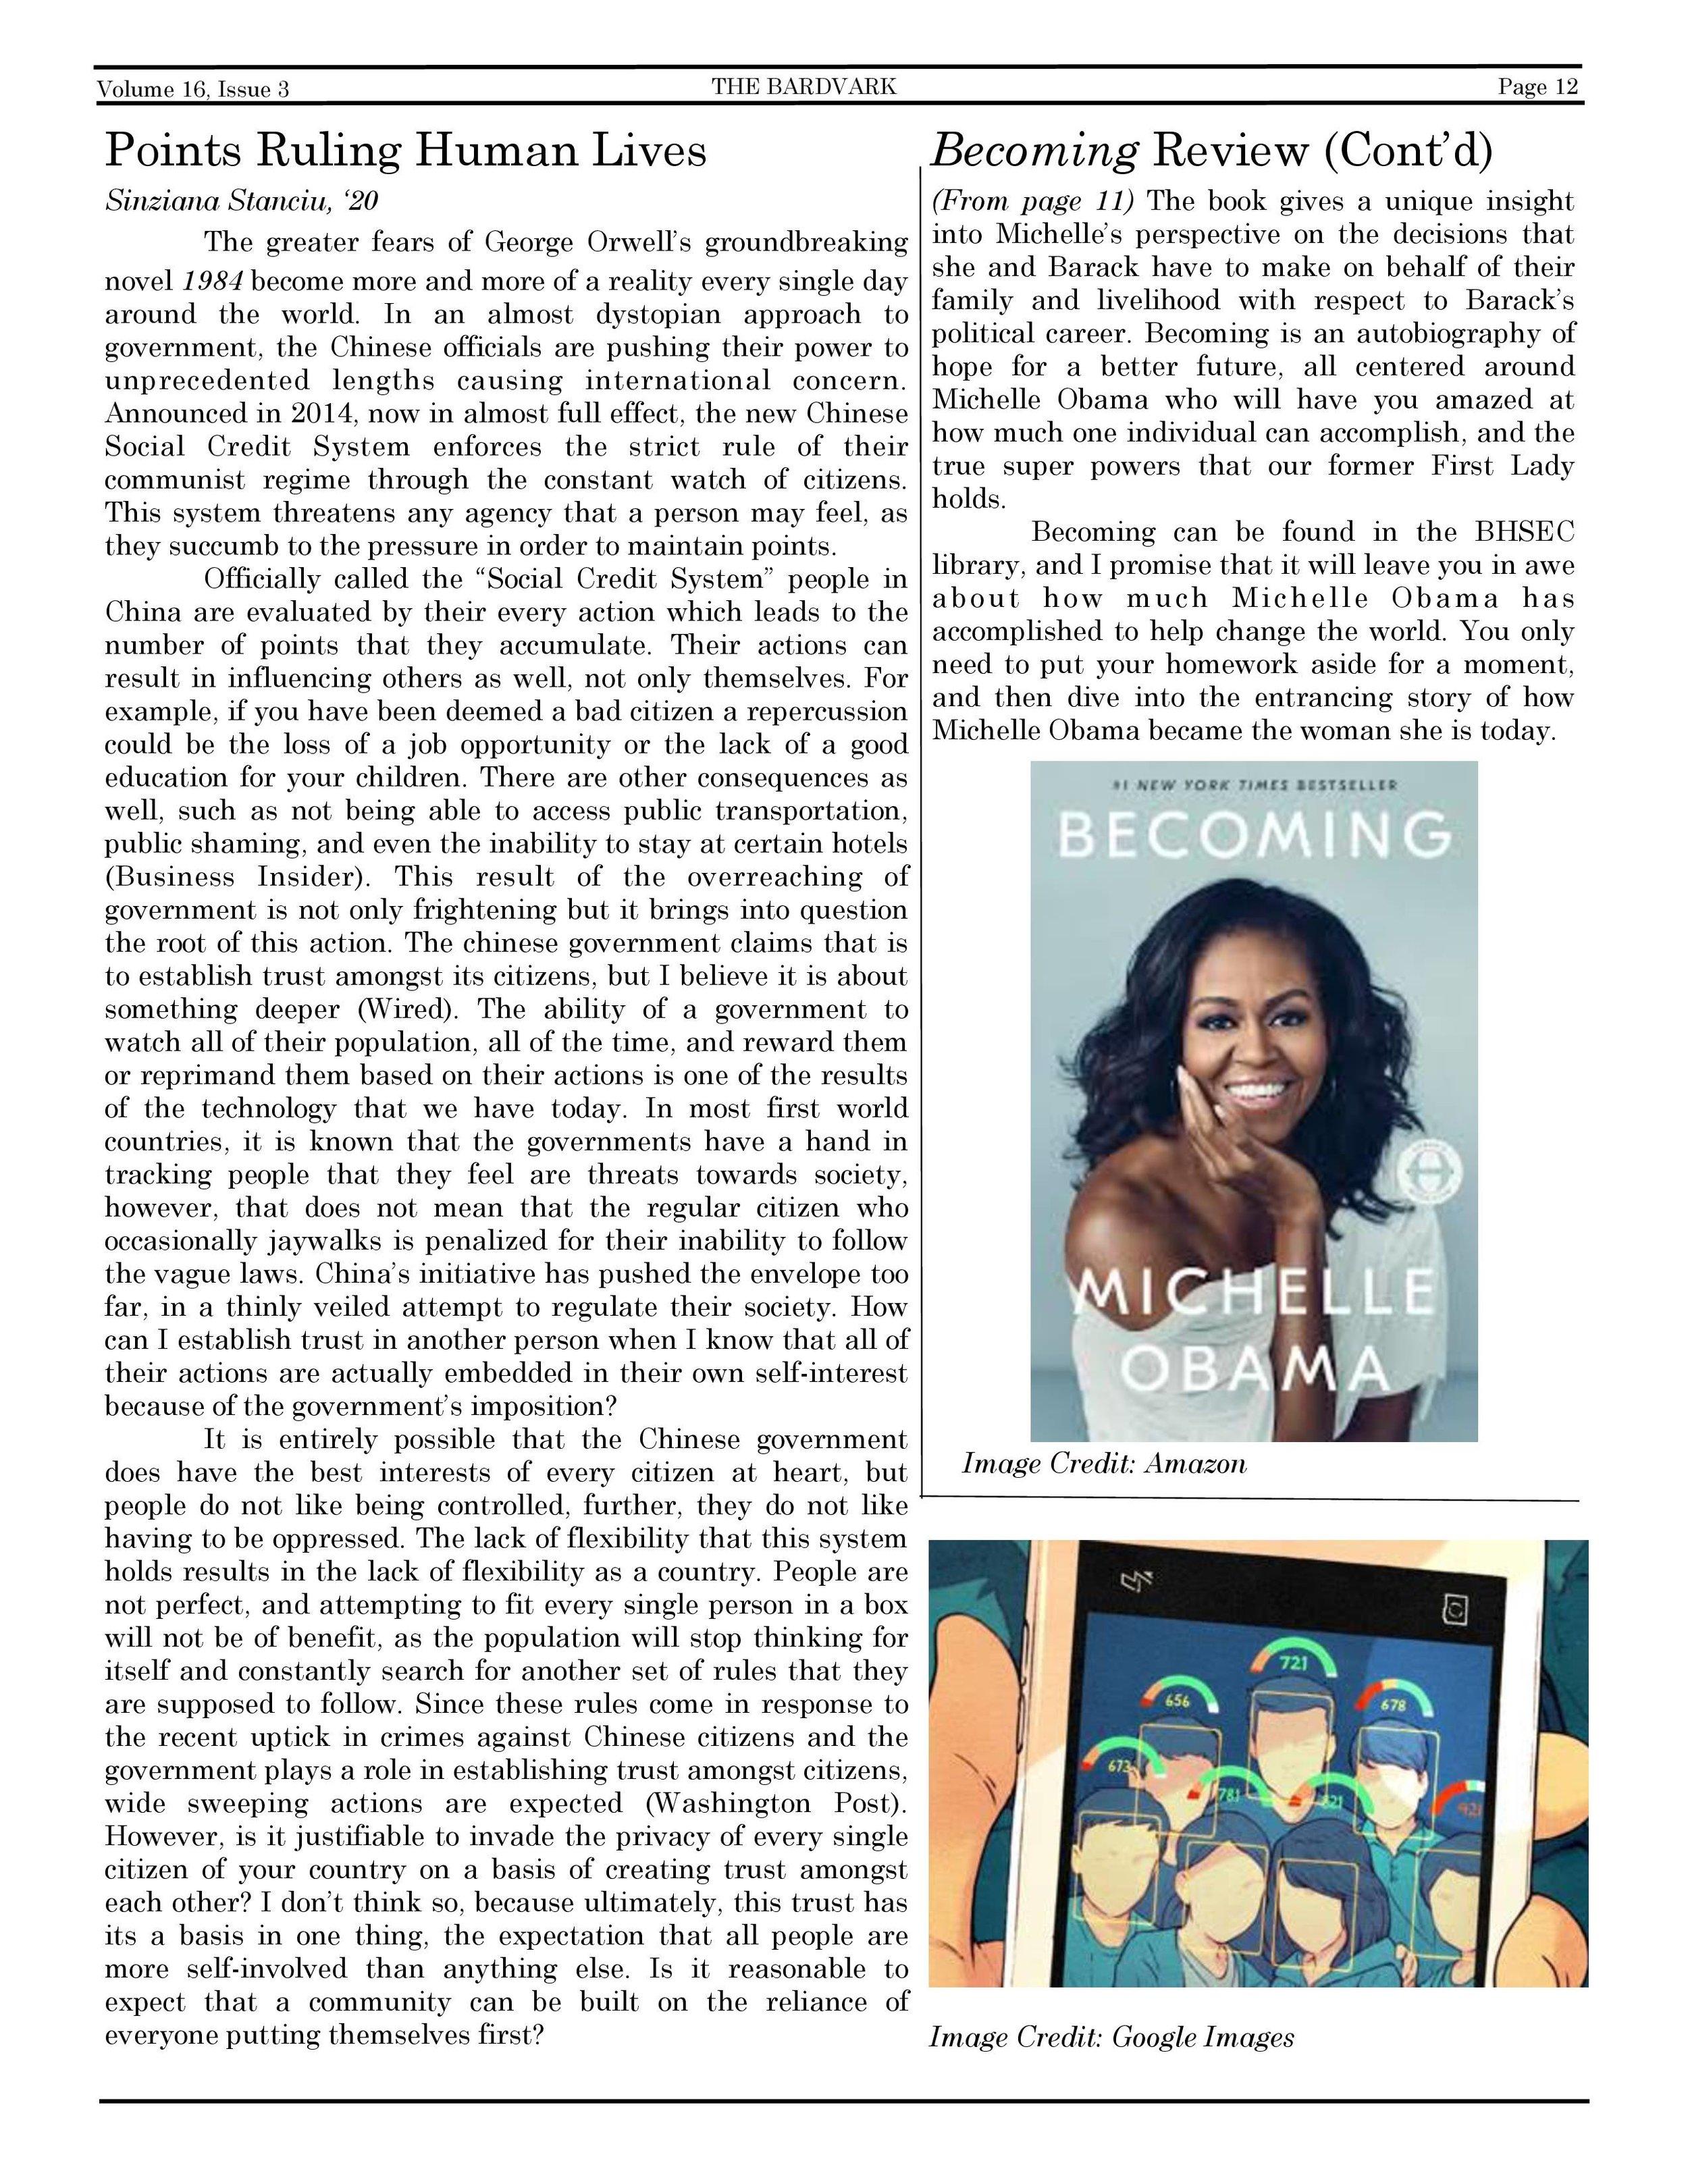 Issue 5 January 2019-12.jpg